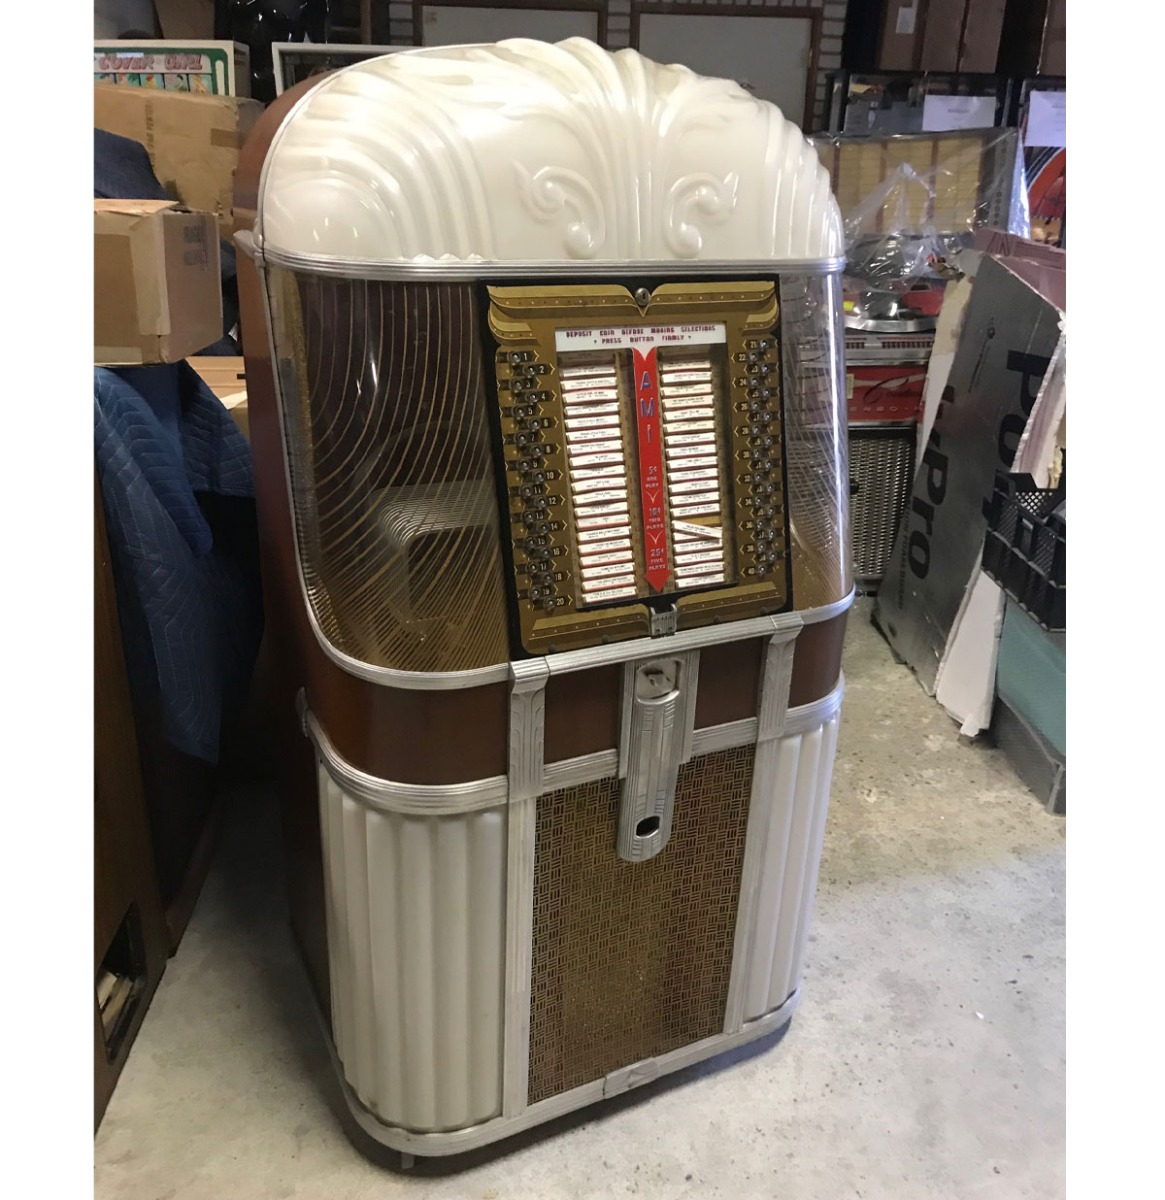 Ami B Jukebox 1948-49 - Origineel